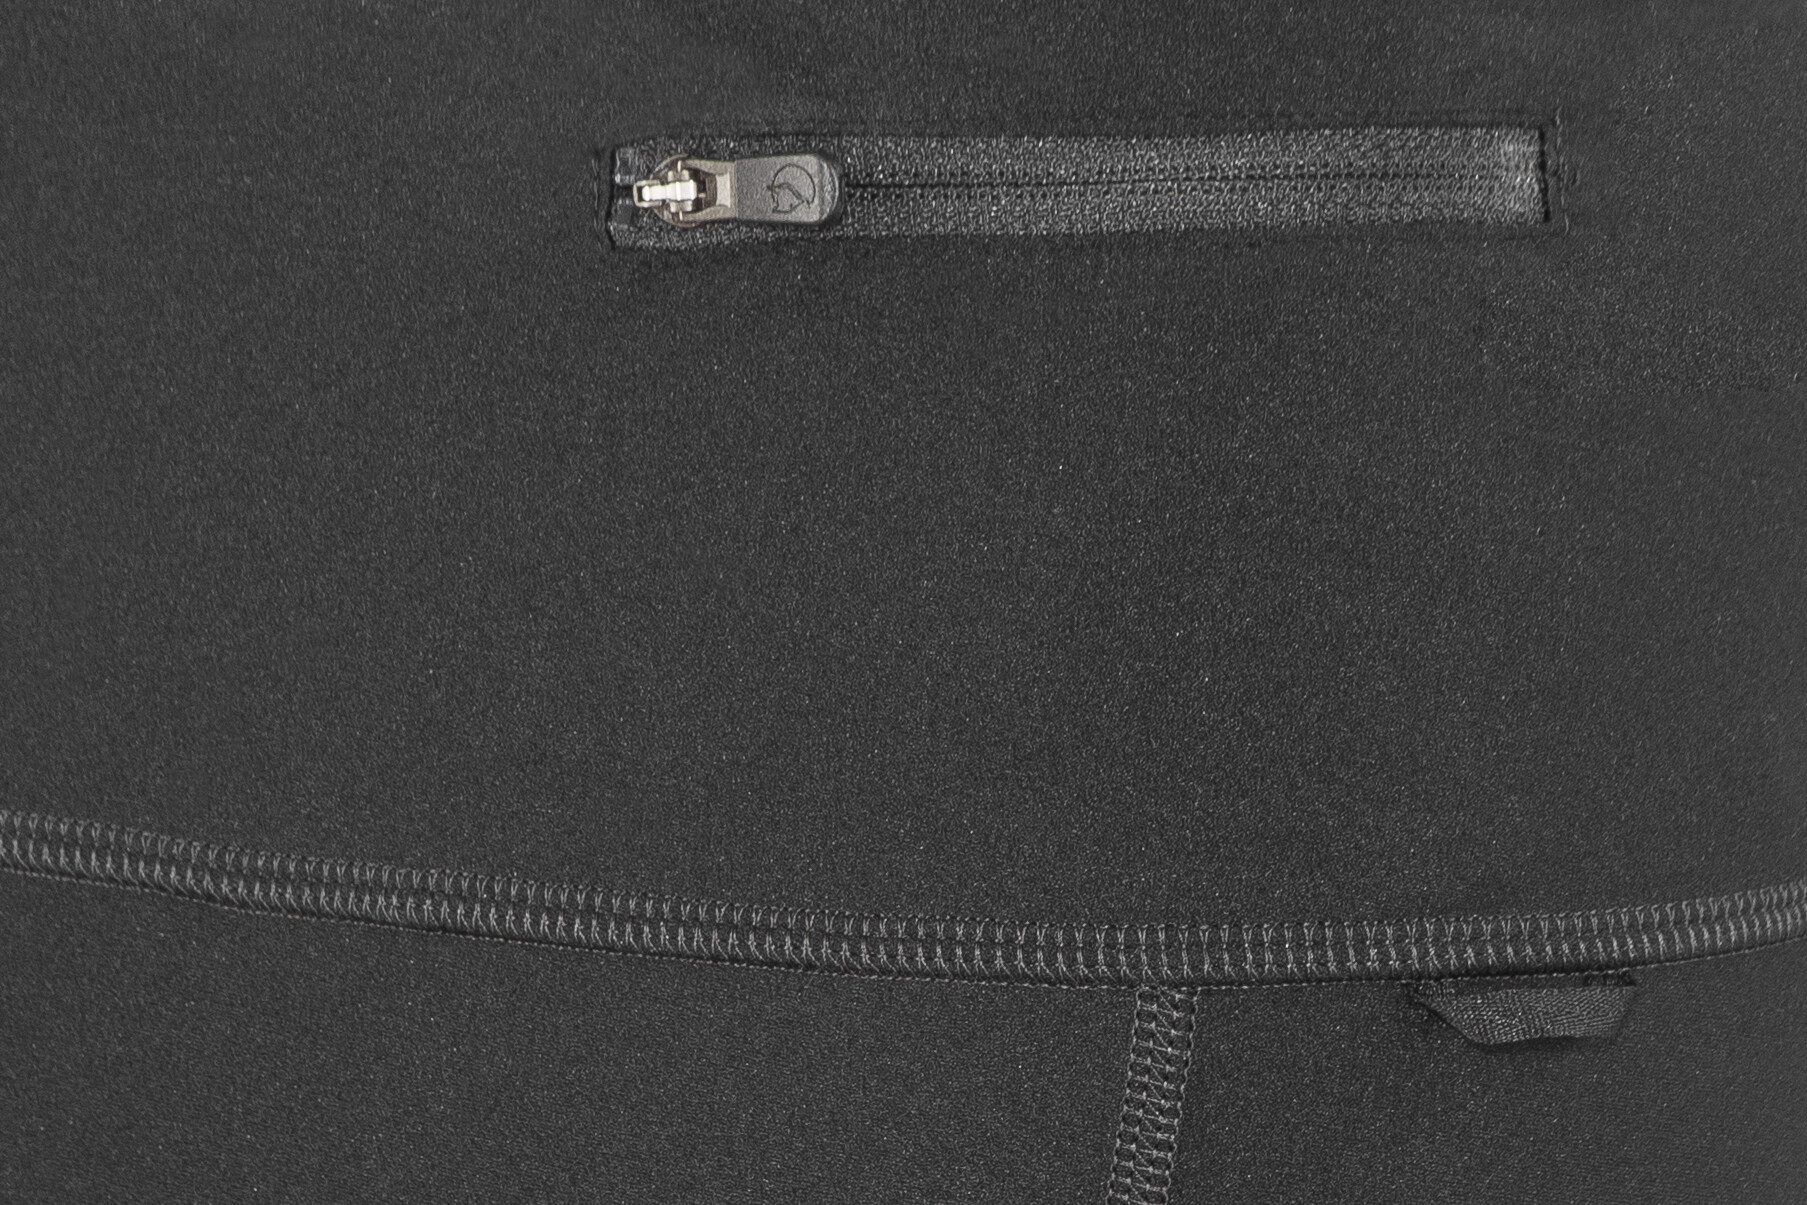 Fjällräven Abisko Trekking Calzamaglia 3/4 Donna, black su Addnature ps174